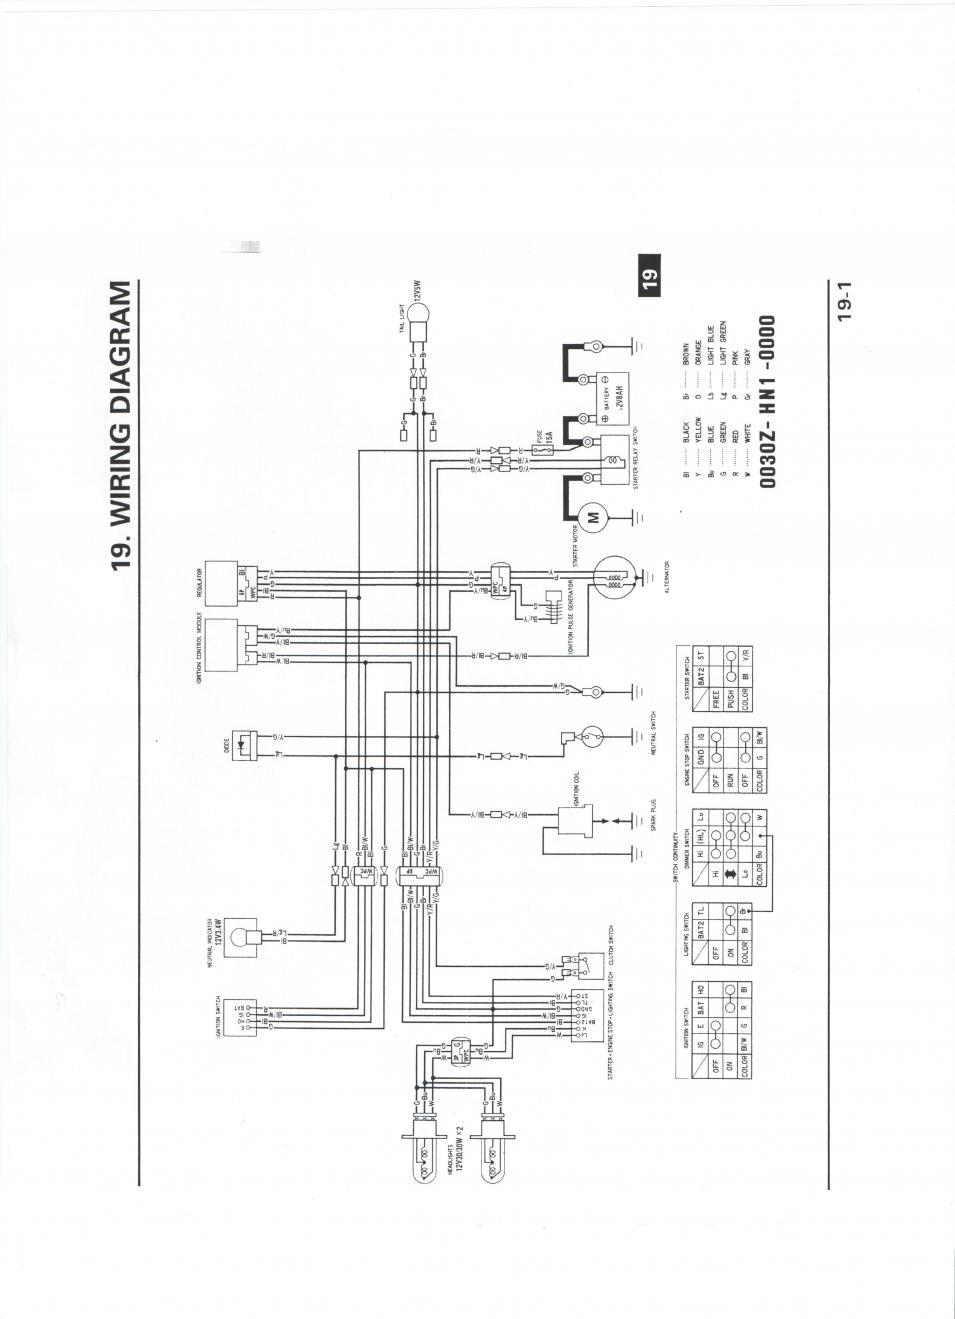 2001 honda trx 400 wiring diagram trusted wiring diagram u2022 rh justwiringdiagram today 2001 honda 400ex headlight wiring diagram